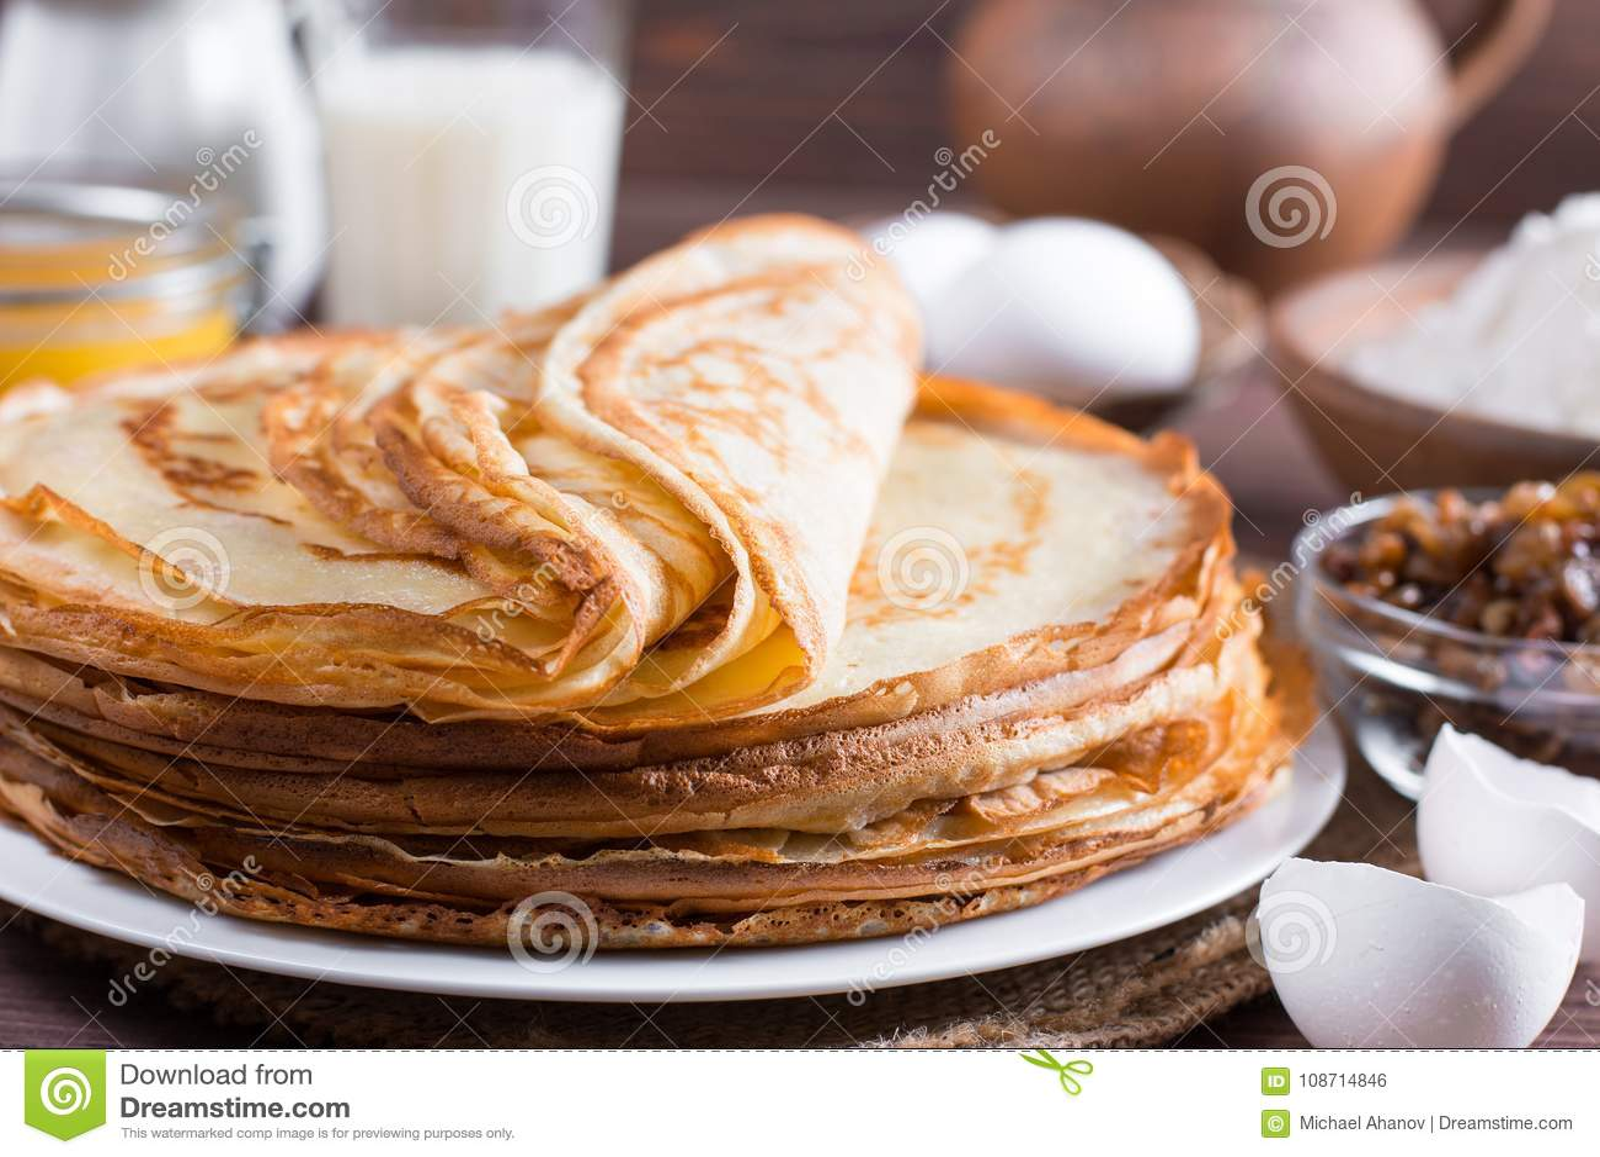 Many pancakes on a wooden background. Traditional Ukrainian or Russian pancakes. Shrovetide Maslenitsa.